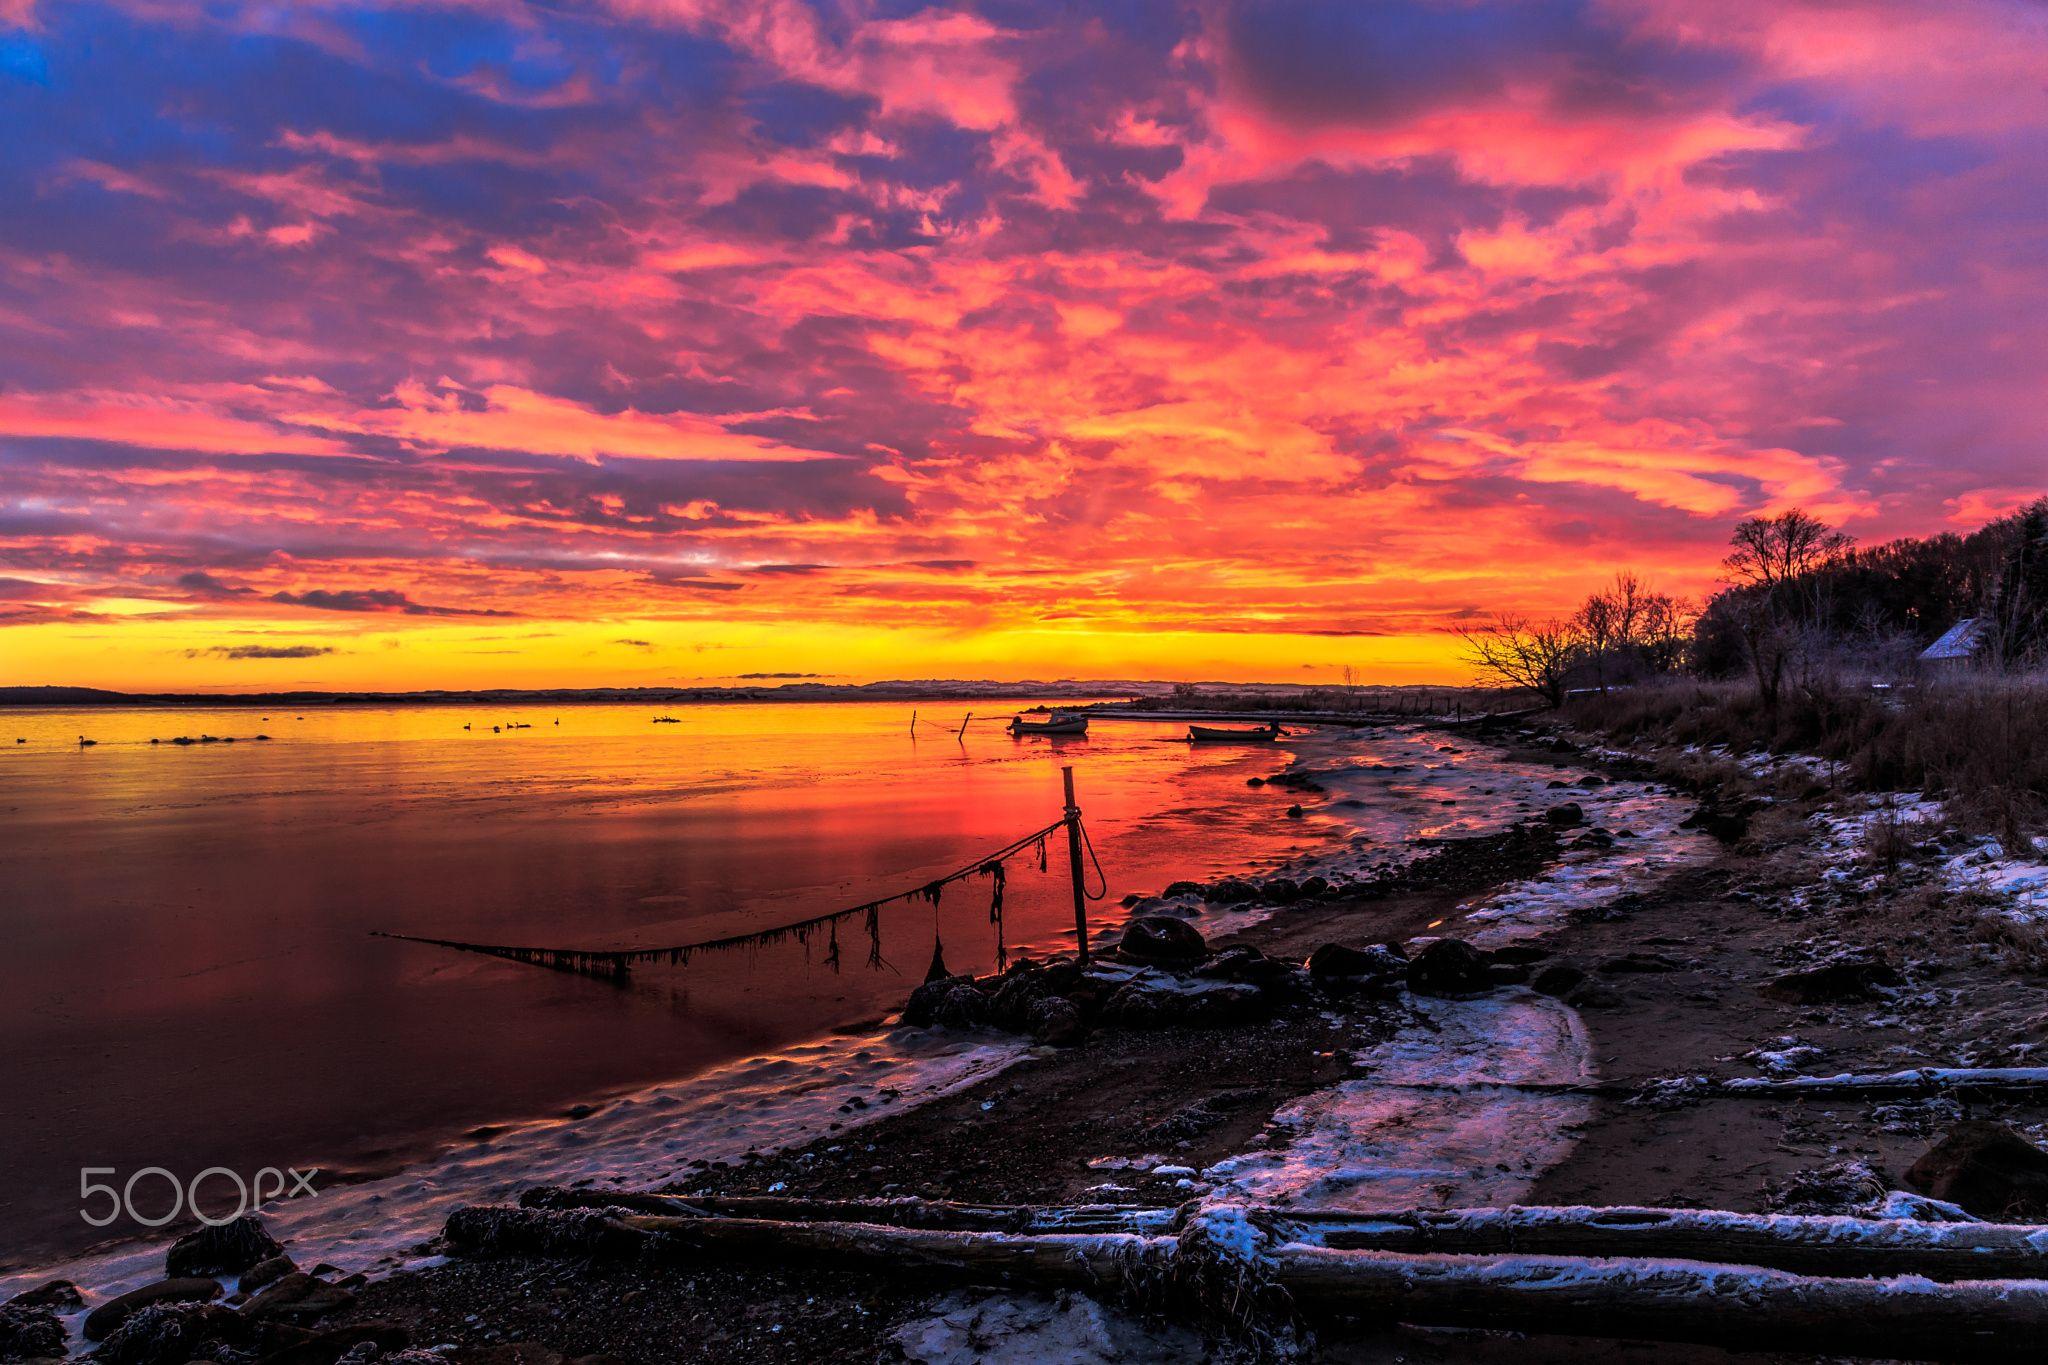 Havhusene Sunrise - Havhusene Sunrise A beautiful sunrise at Havhusene Gl. Løgten Denmark enjoy